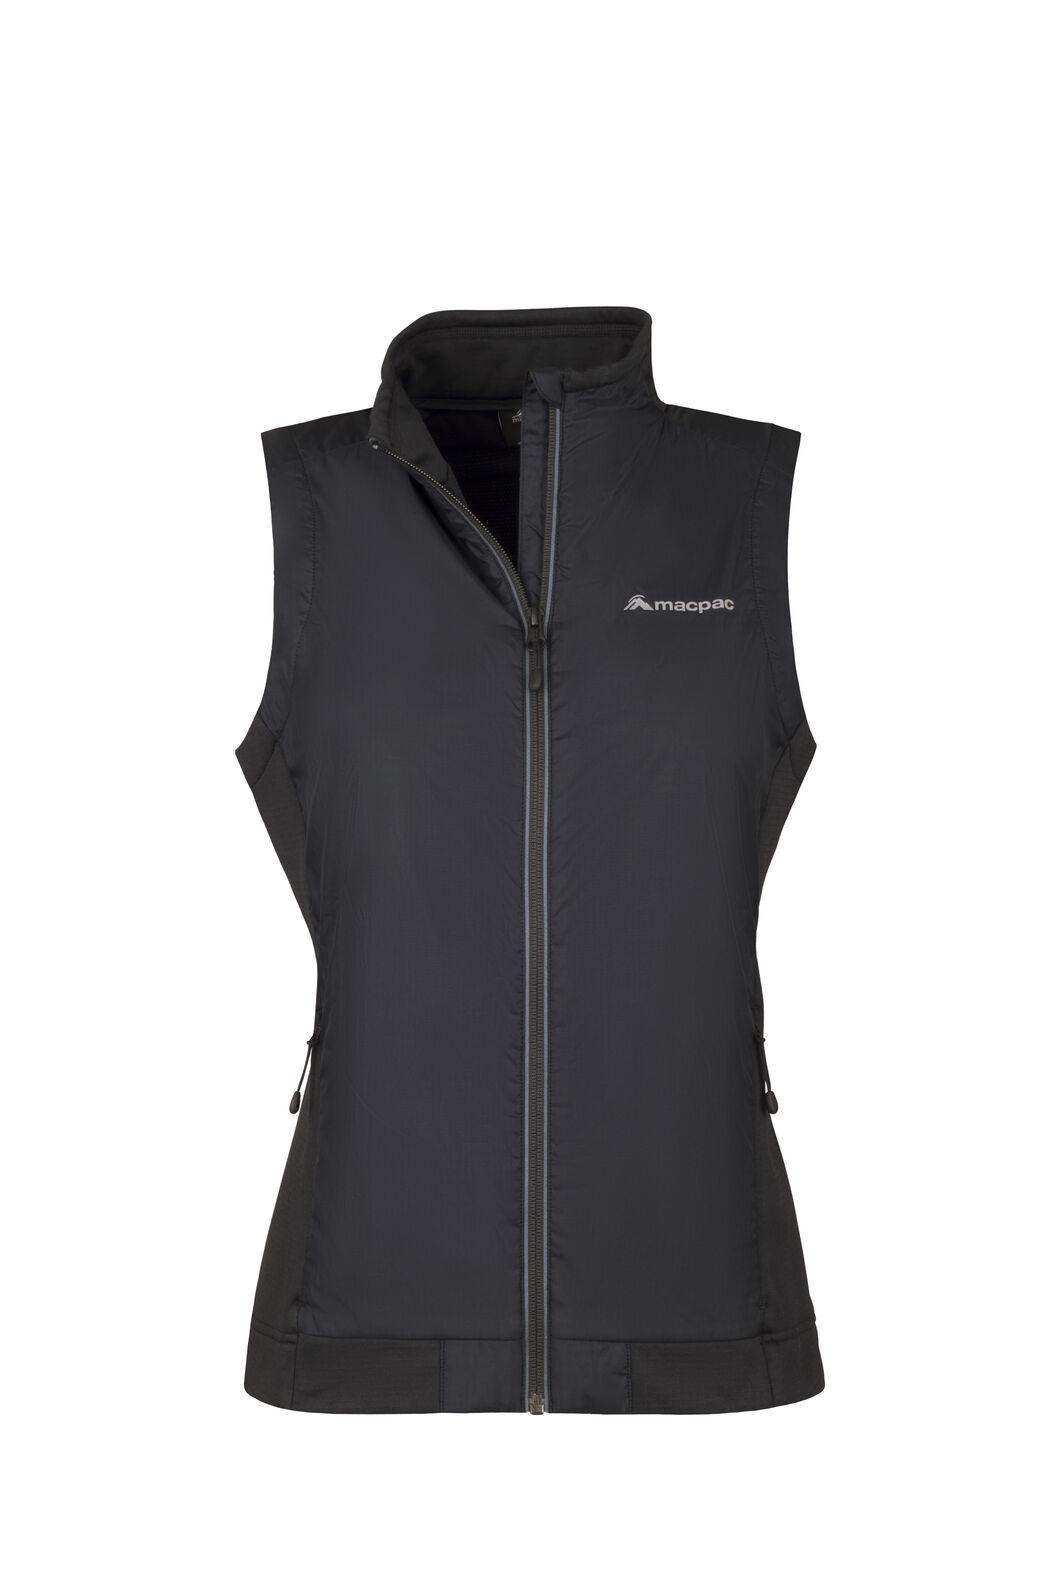 Macpac Saros Polartec® Alpha® Vest - Women's, Black, hi-res